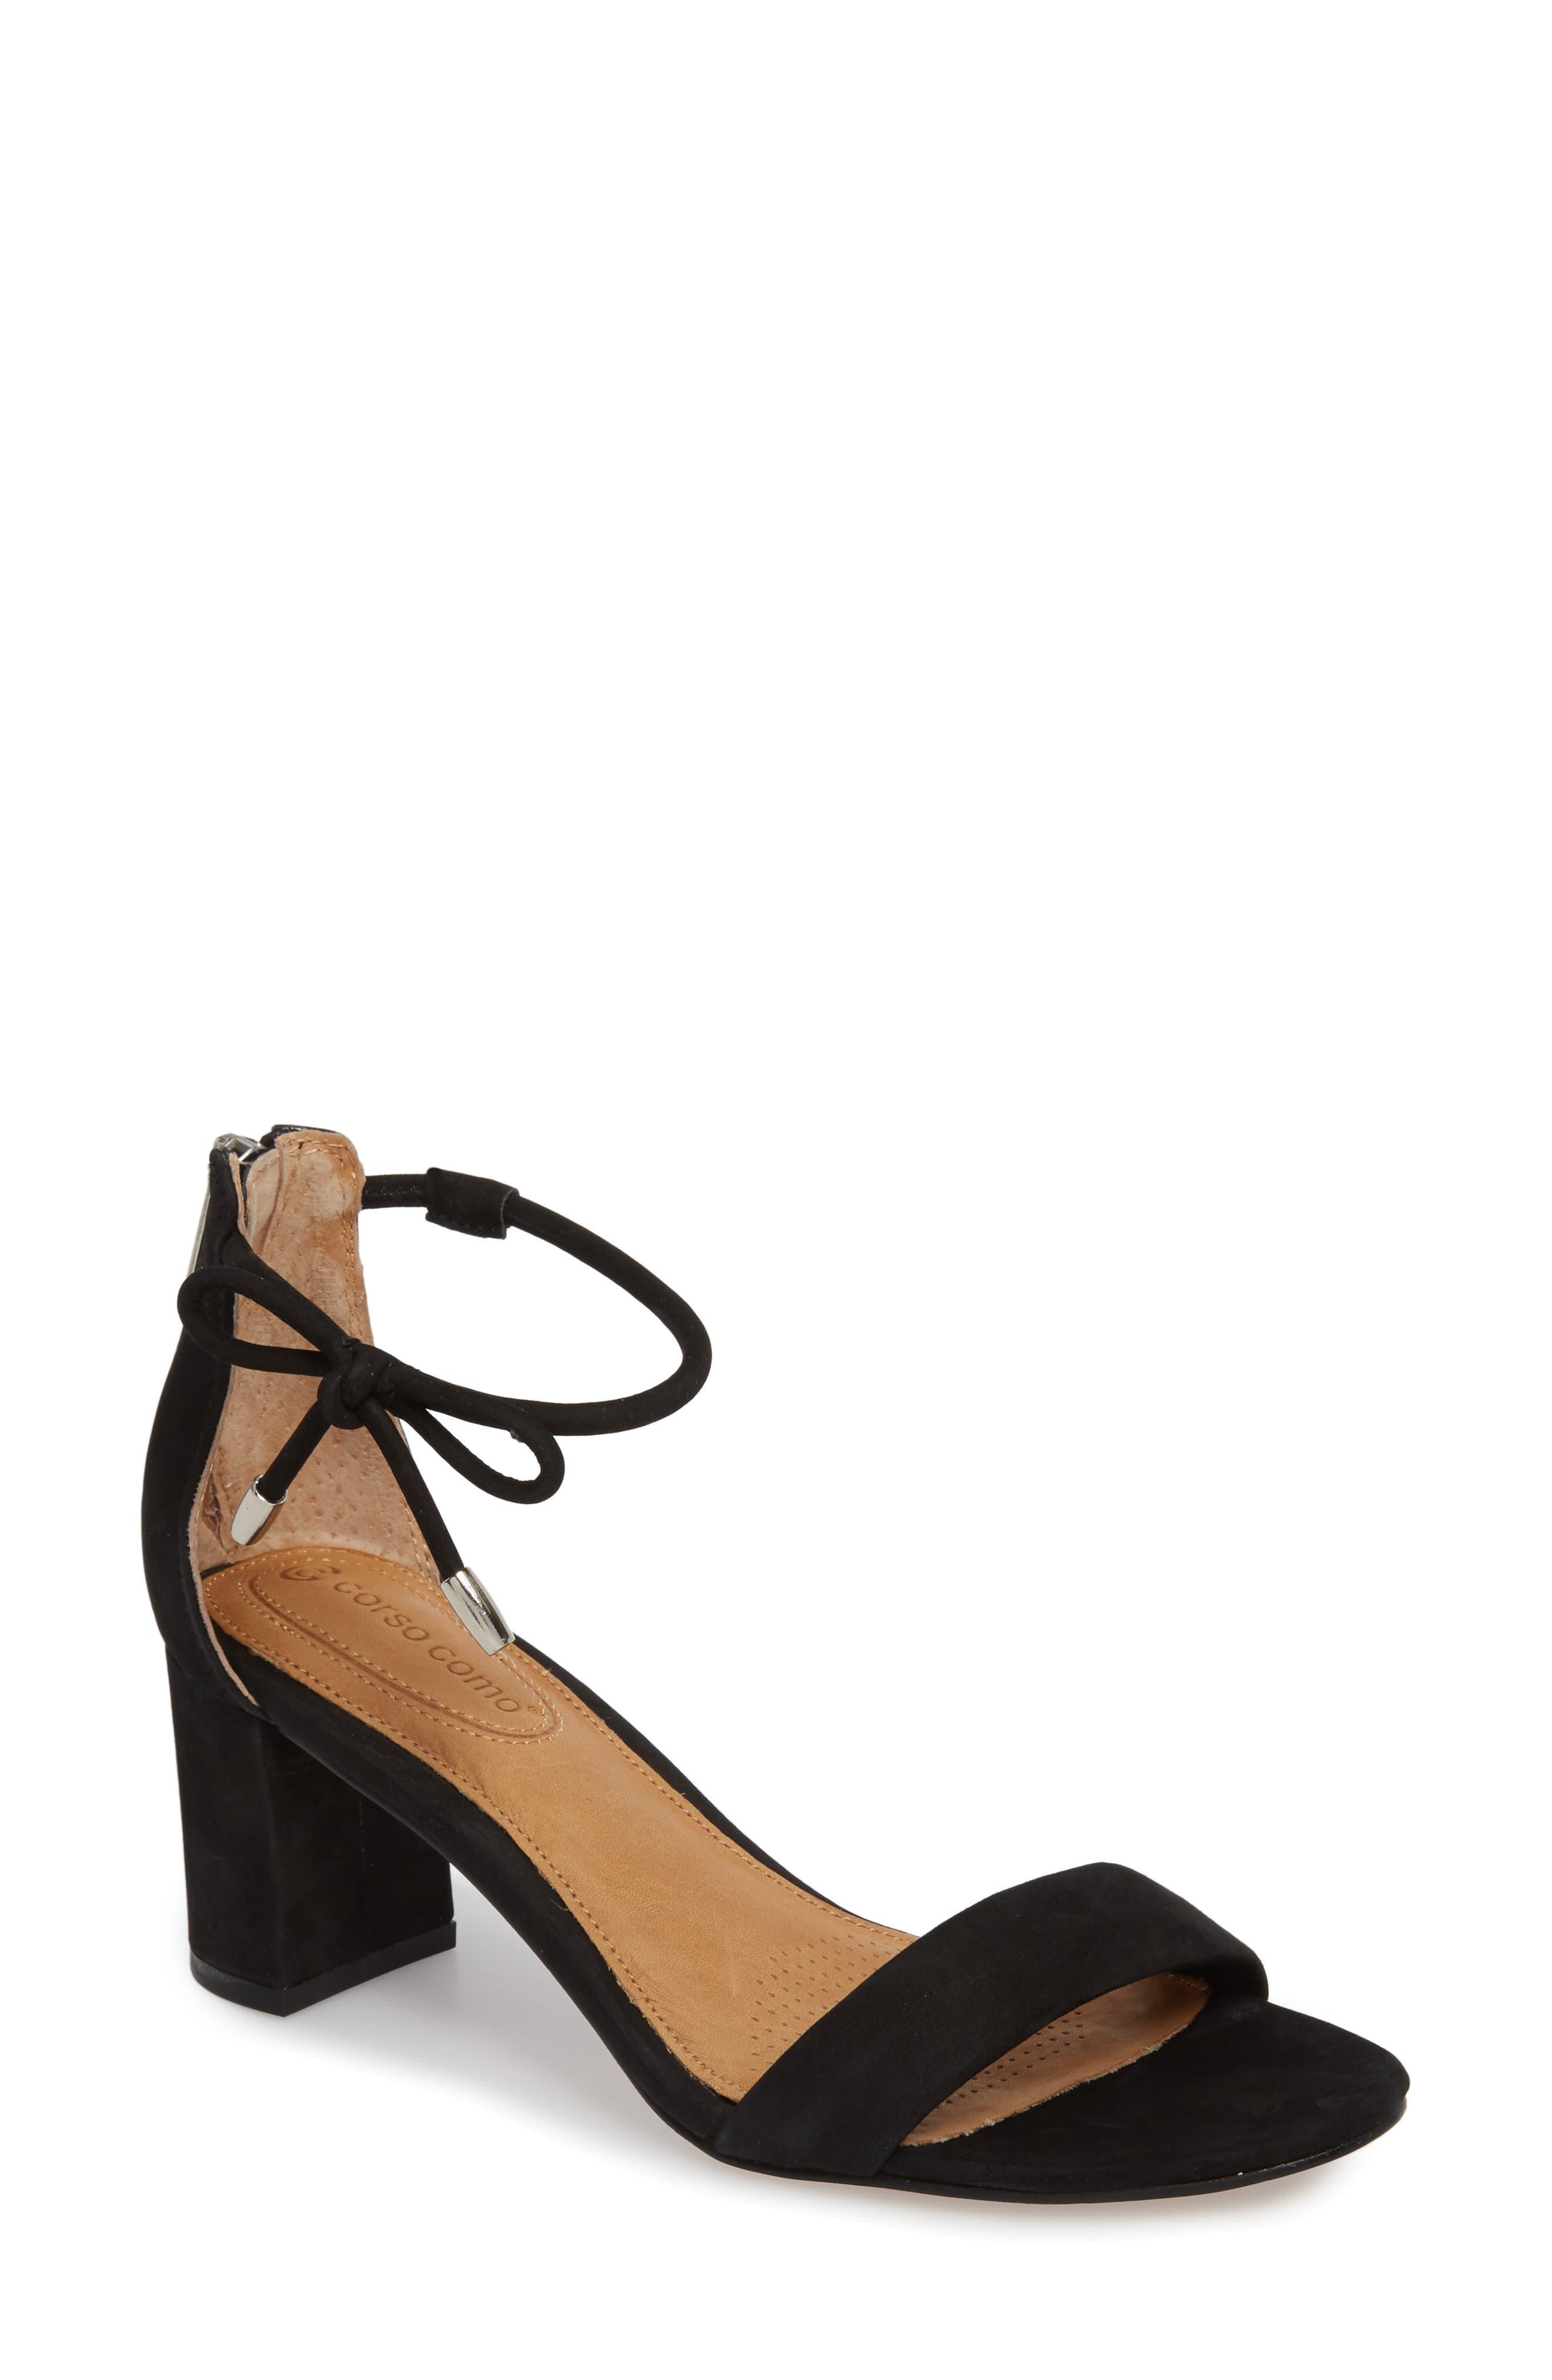 Celebratt Ankle Strap Sandal,                         Main,                         color, 001